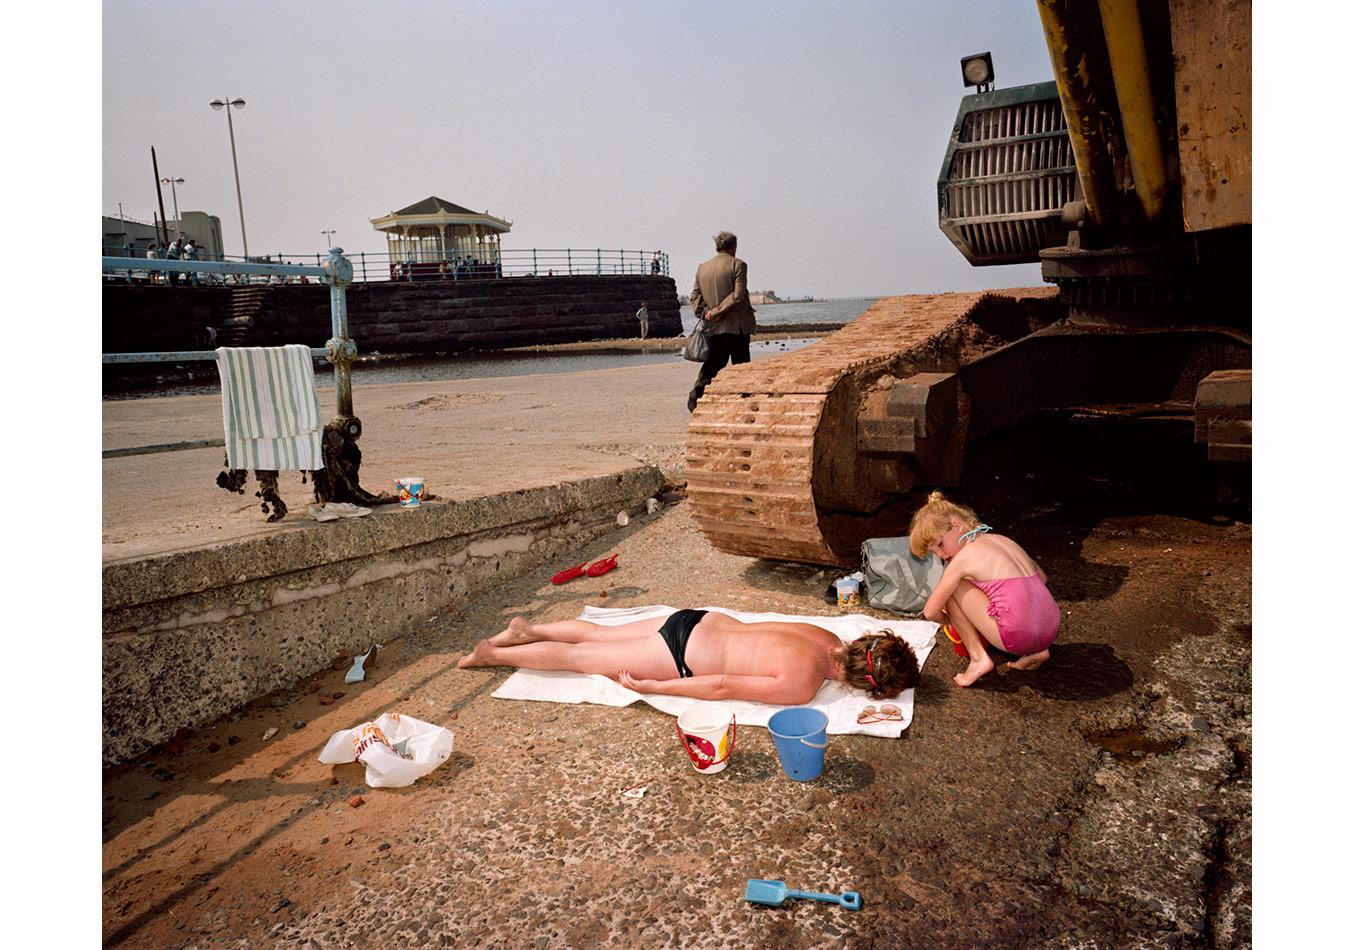 © Martin Parr /Magnum Photos,New Brighton, İngiltere, 1983-1985. 'Son Sayfiye' serisinden.